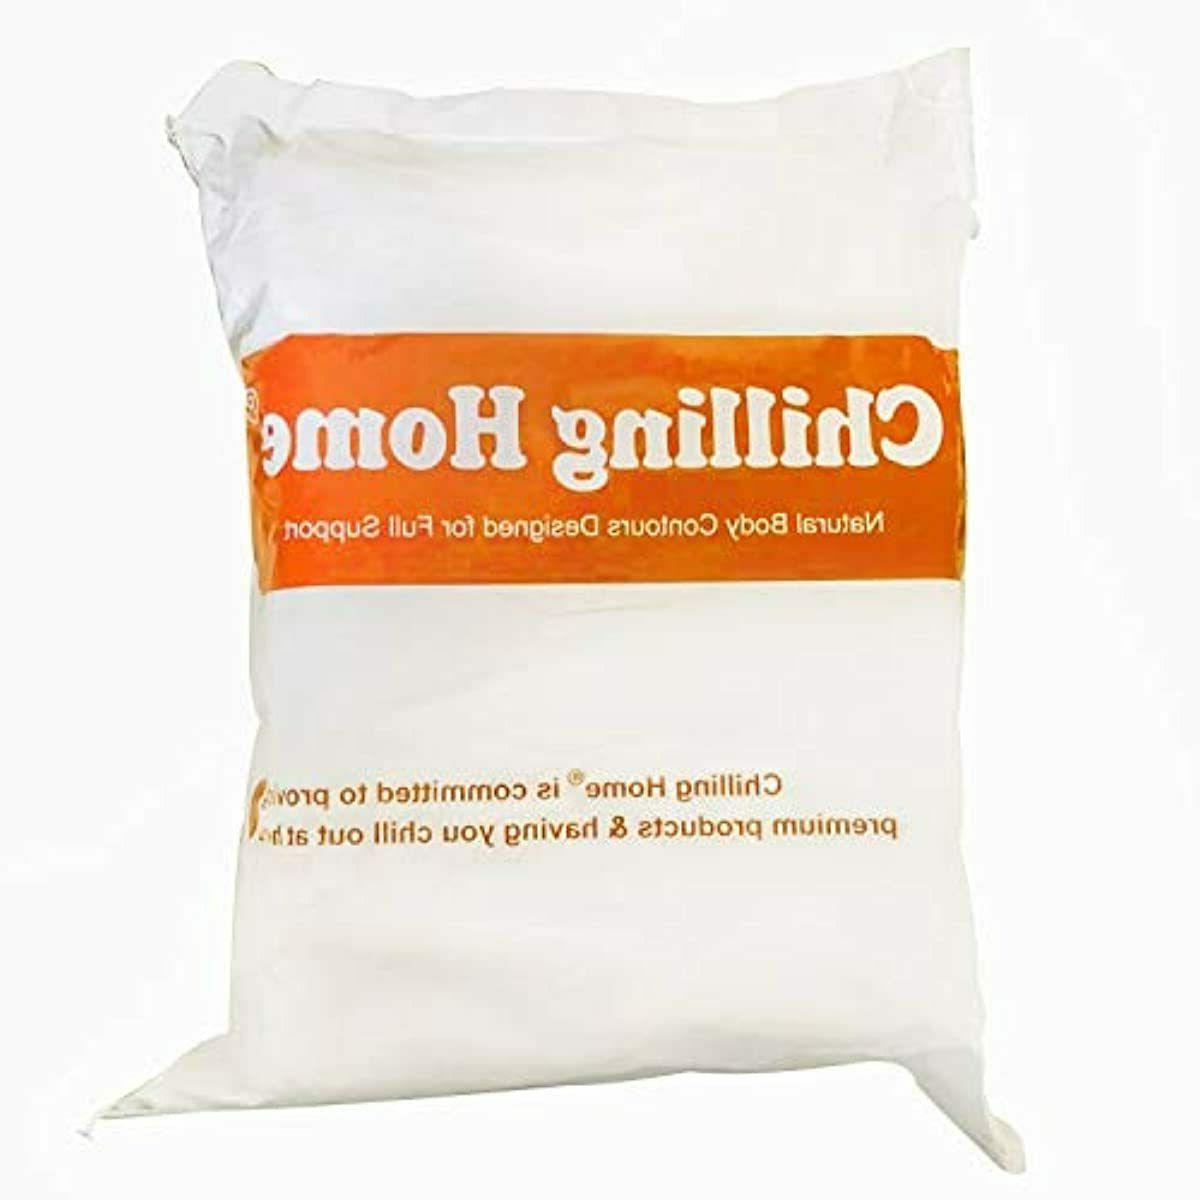 Pregnancy Pillow Full Pillow C Shaped Zootzi